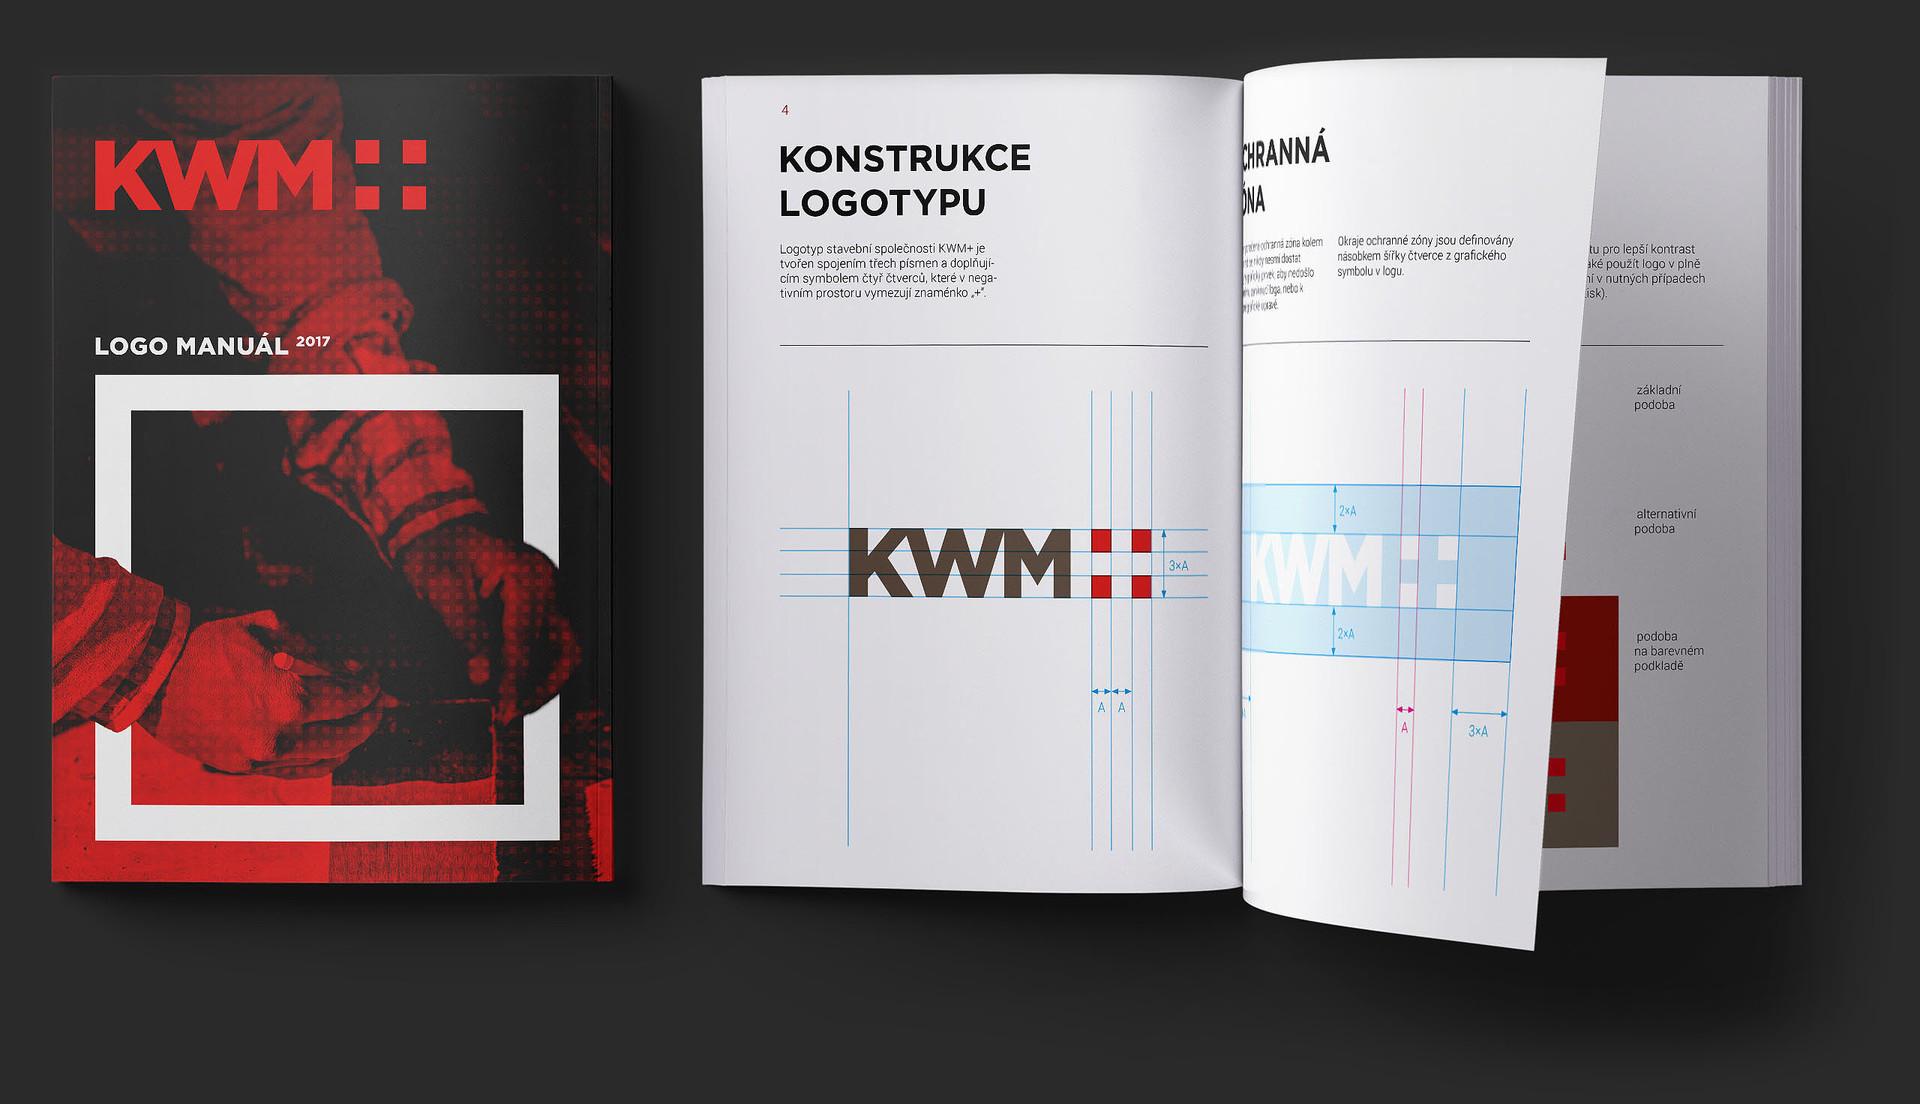 KWM plus logo manuál